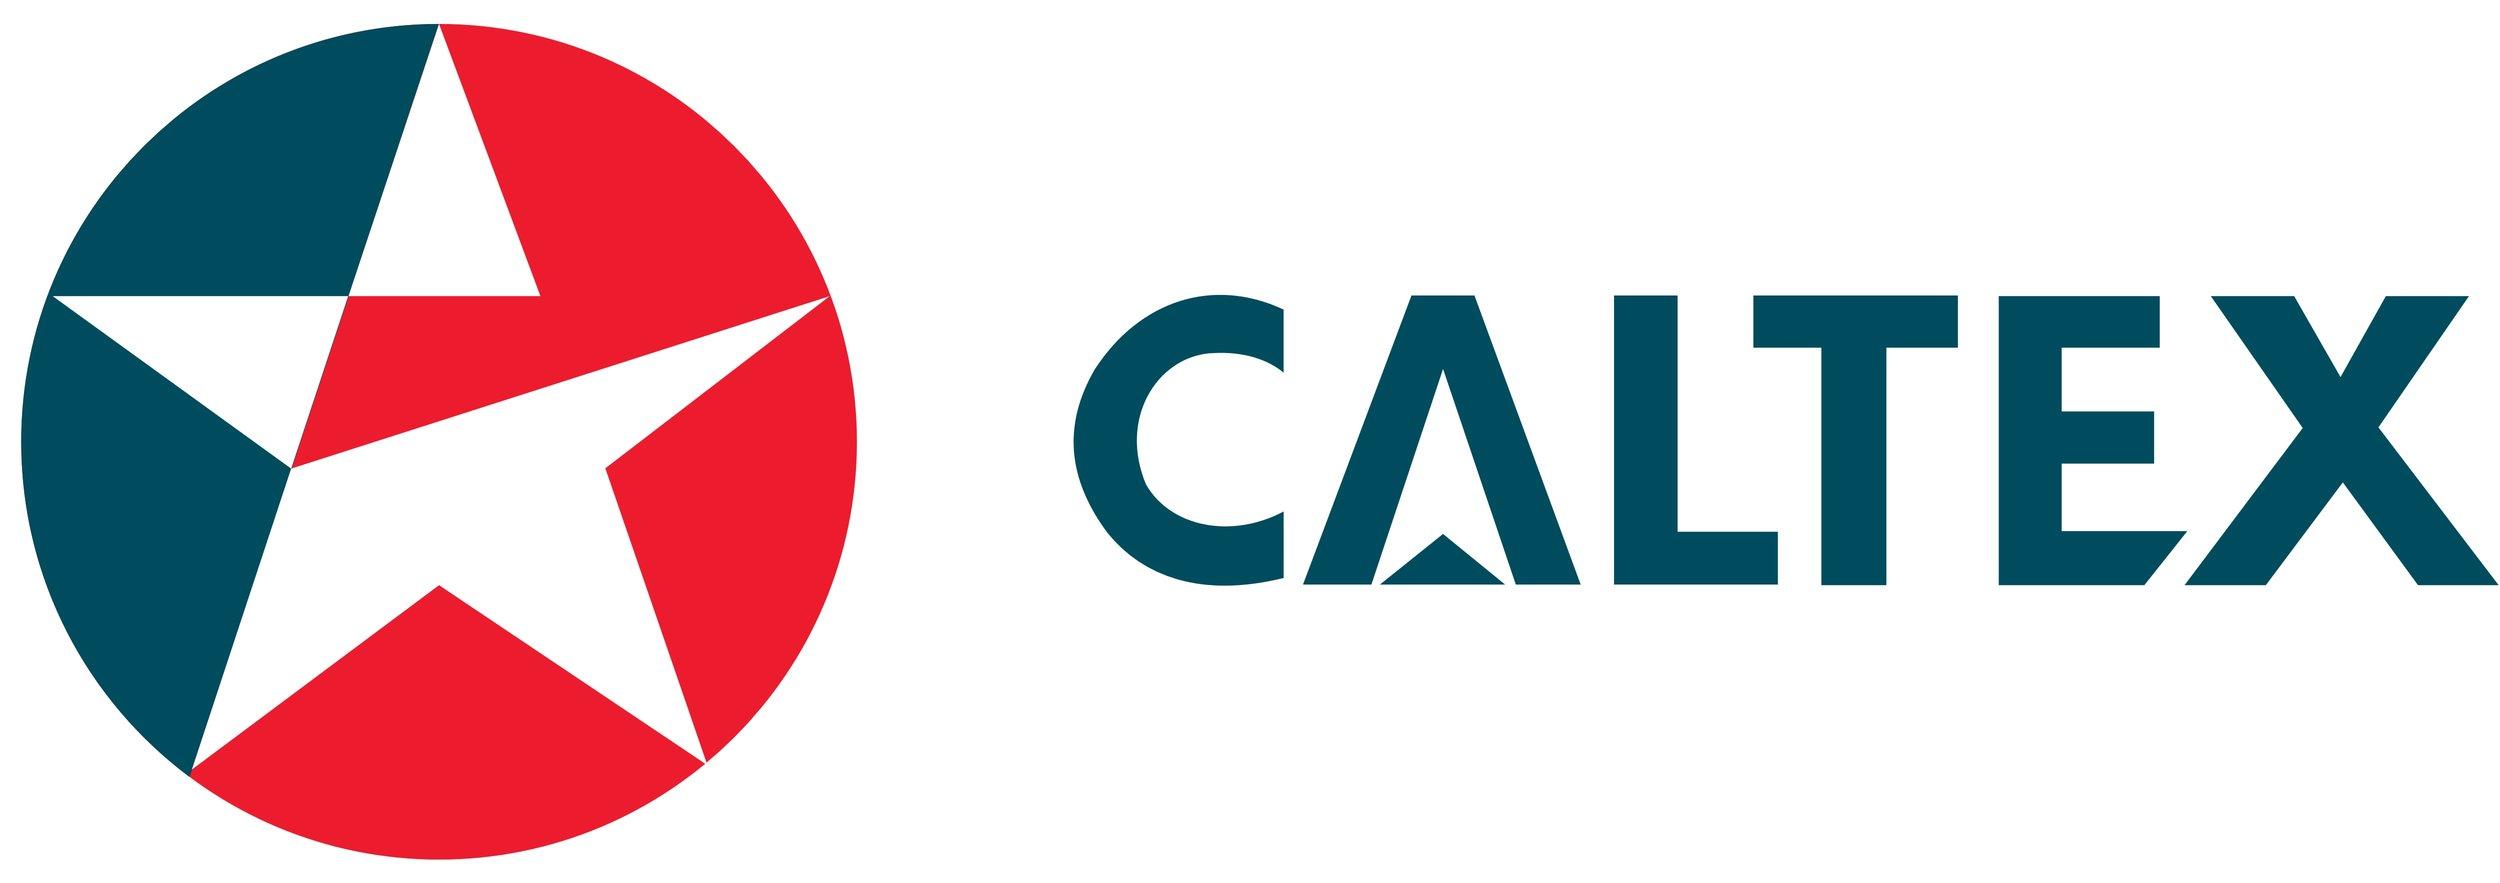 Caltex_logo_logotype.jpg